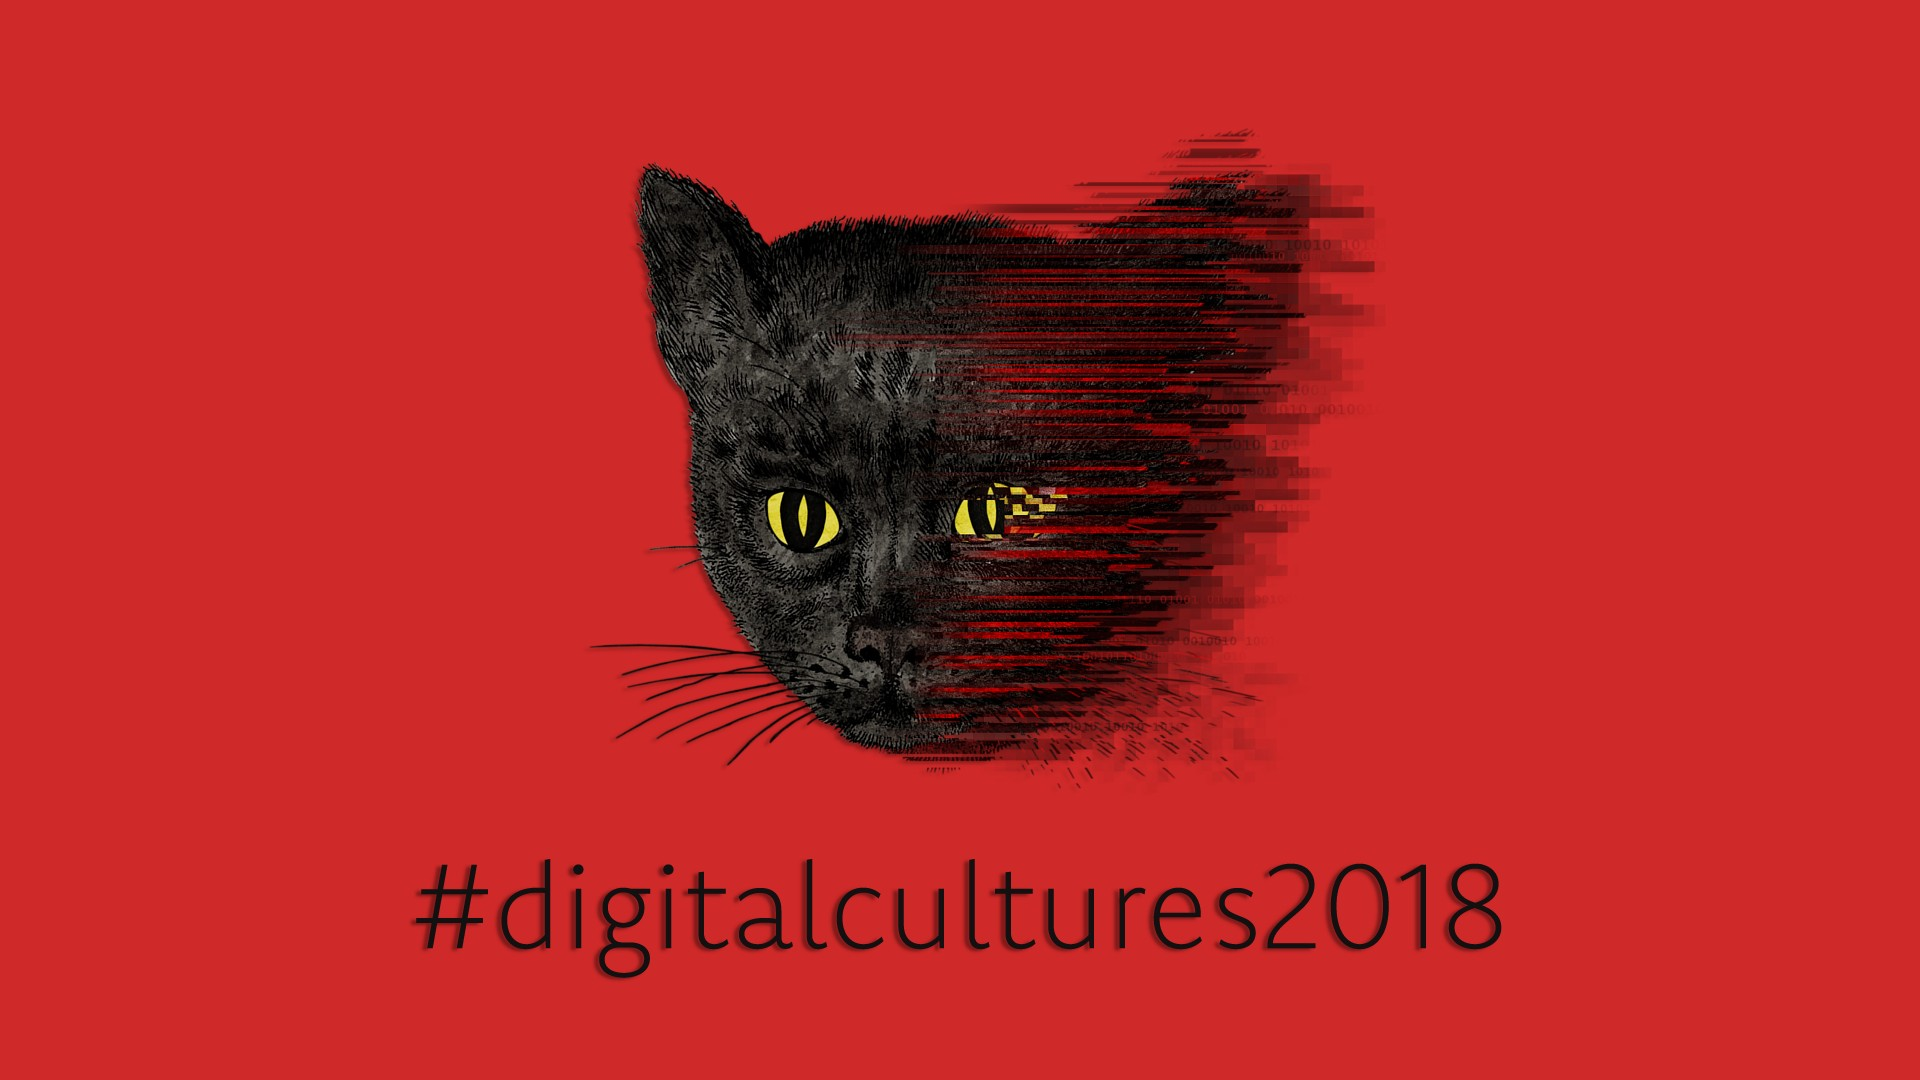 Digital Cultures 2018 (źródło: materiały prasowe organizatora)